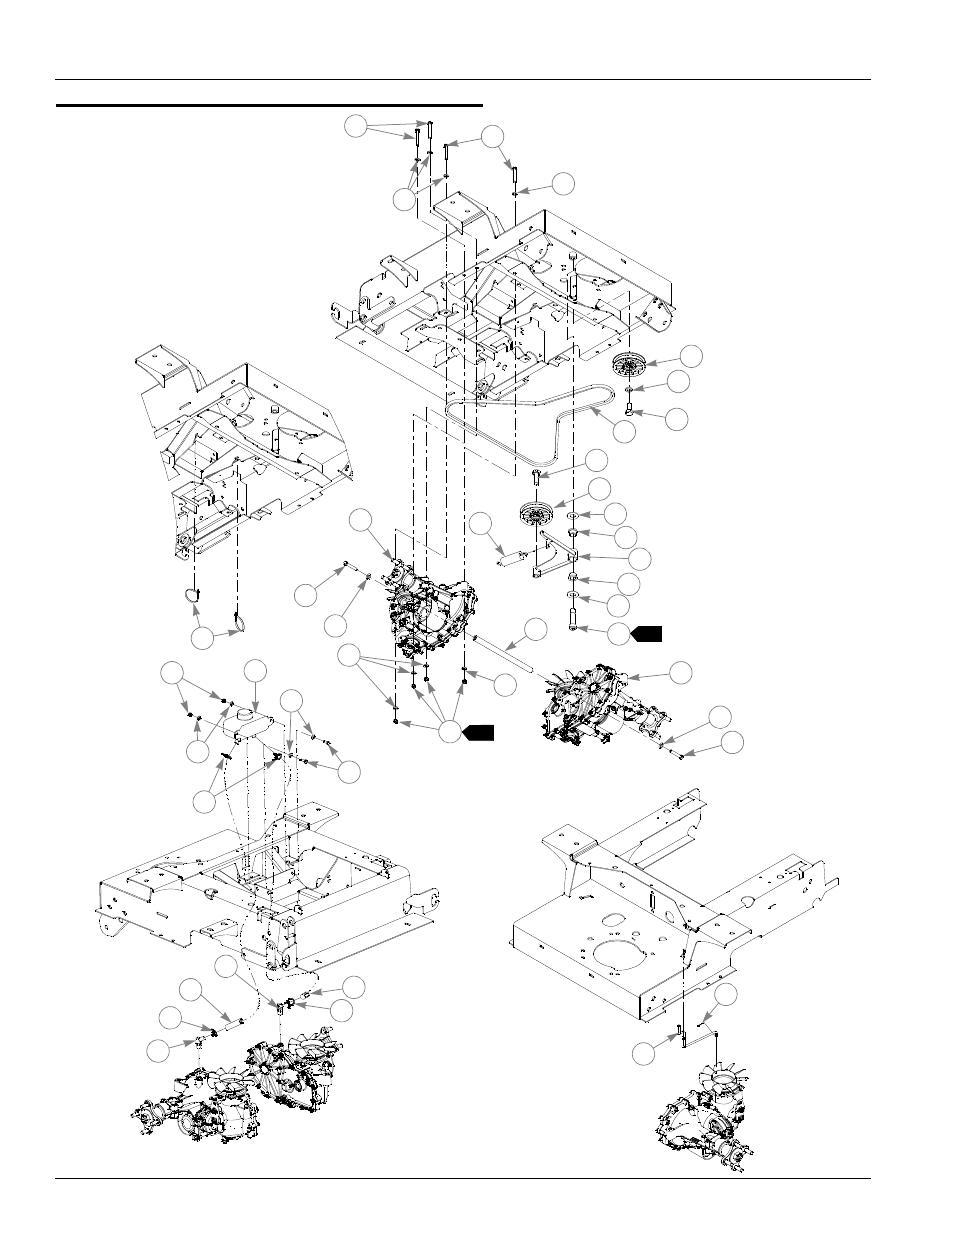 Hydro transmission installation, Hydro transmission